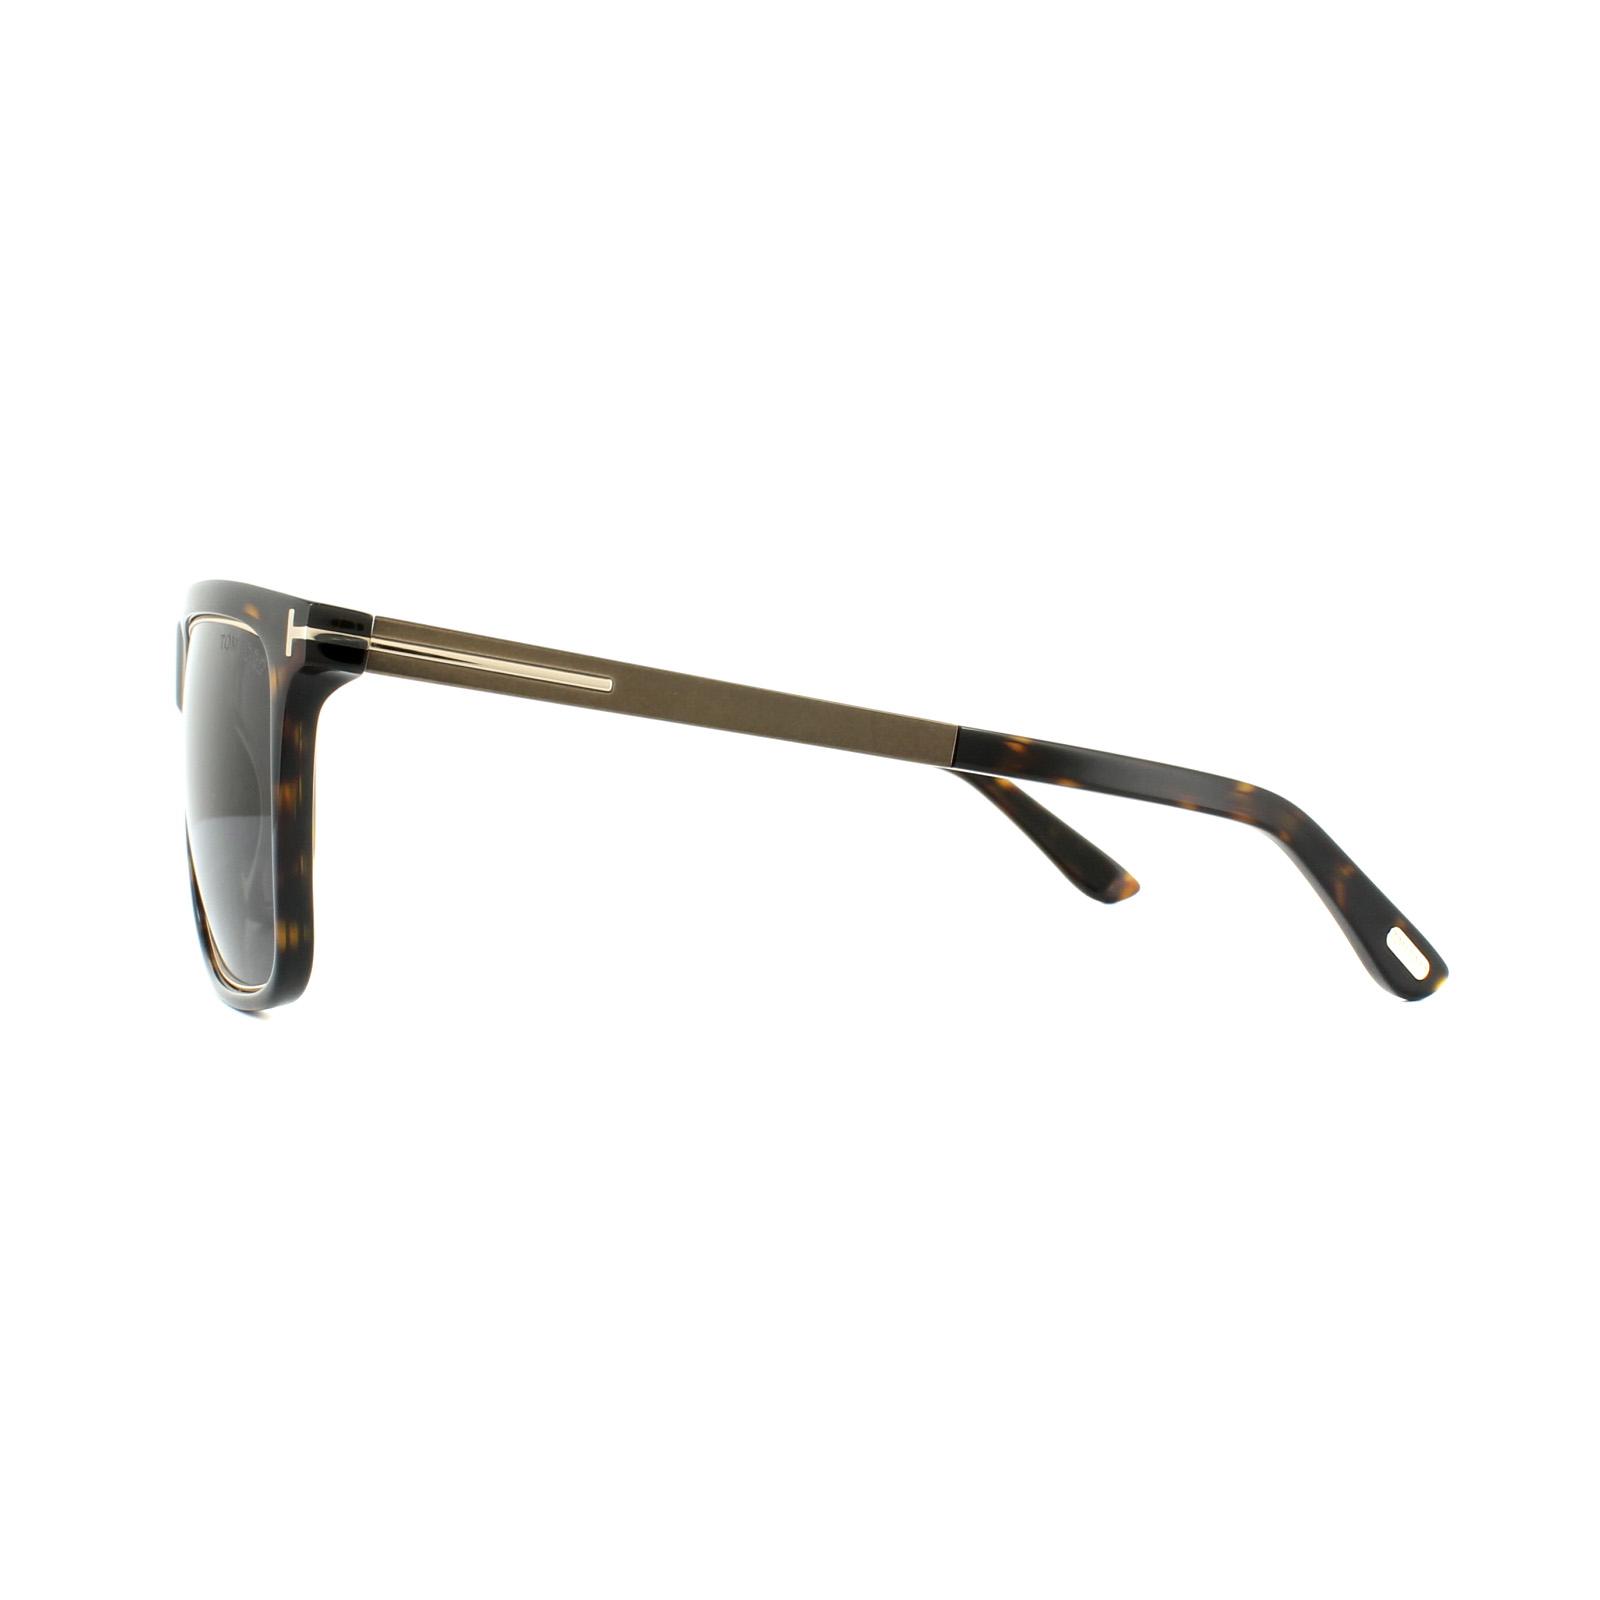 Tom Ford Sunglasses 0392 Karlie 52J Havana Dark Bronze Dark Grey